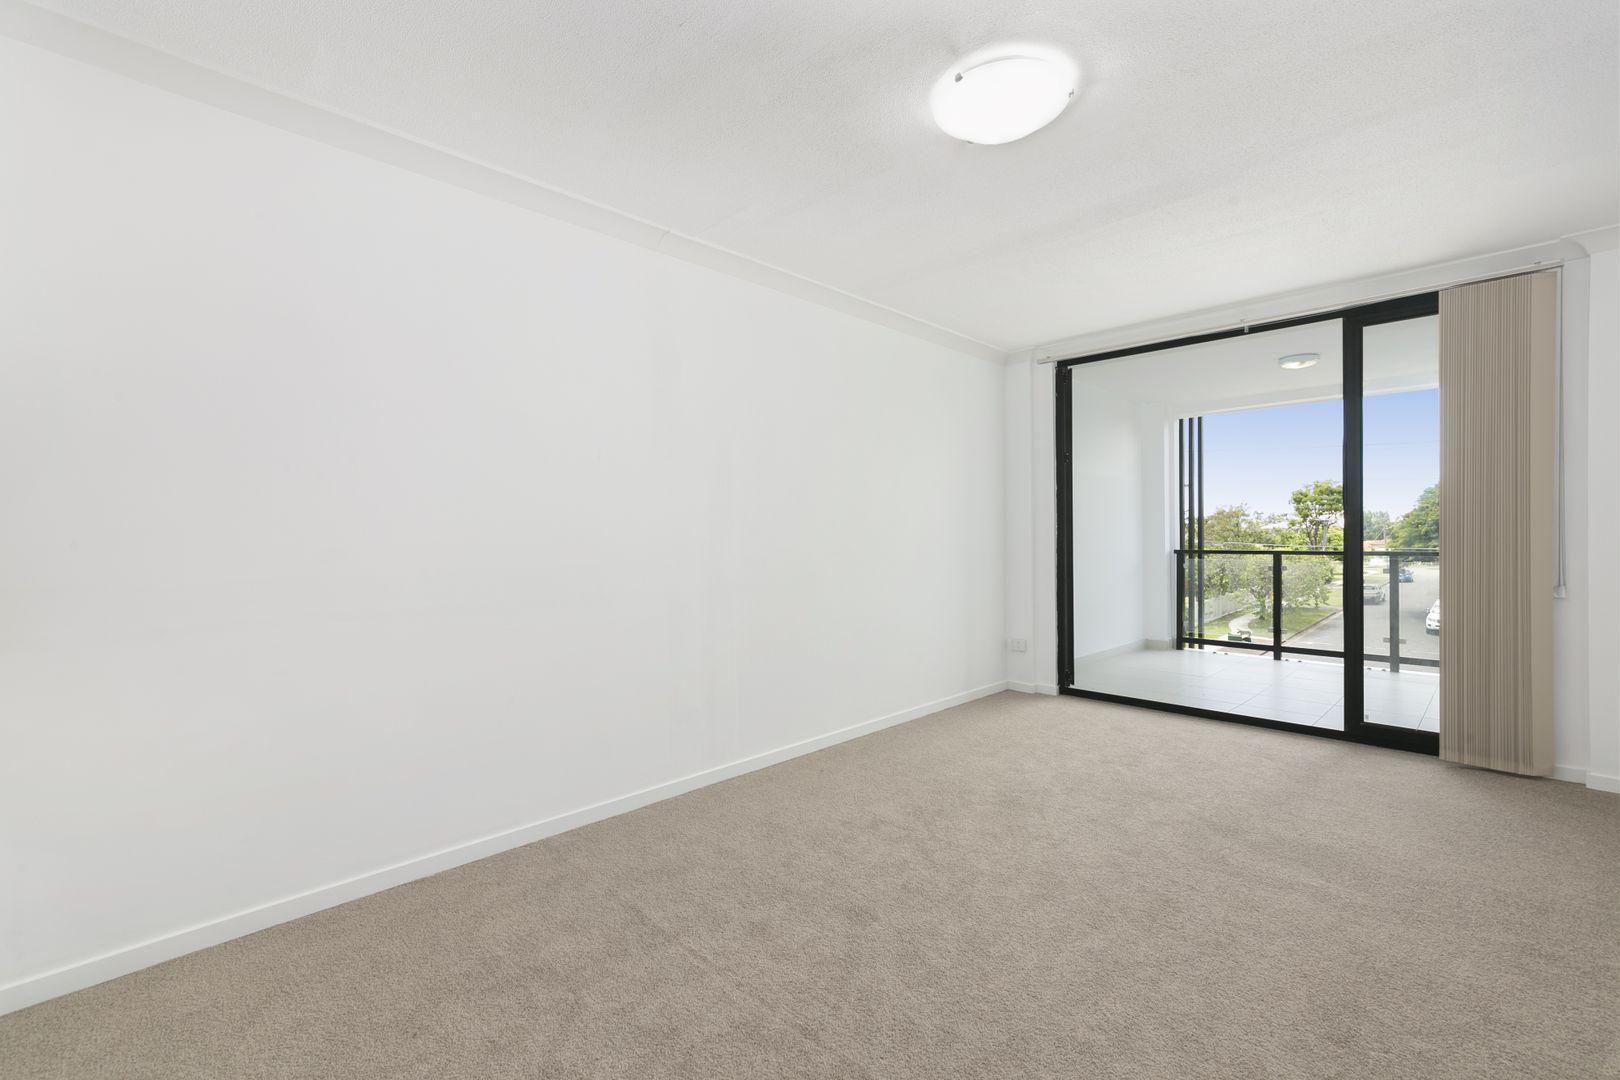 44 Mascar Street, Upper Mount Gravatt QLD 4122, Image 2